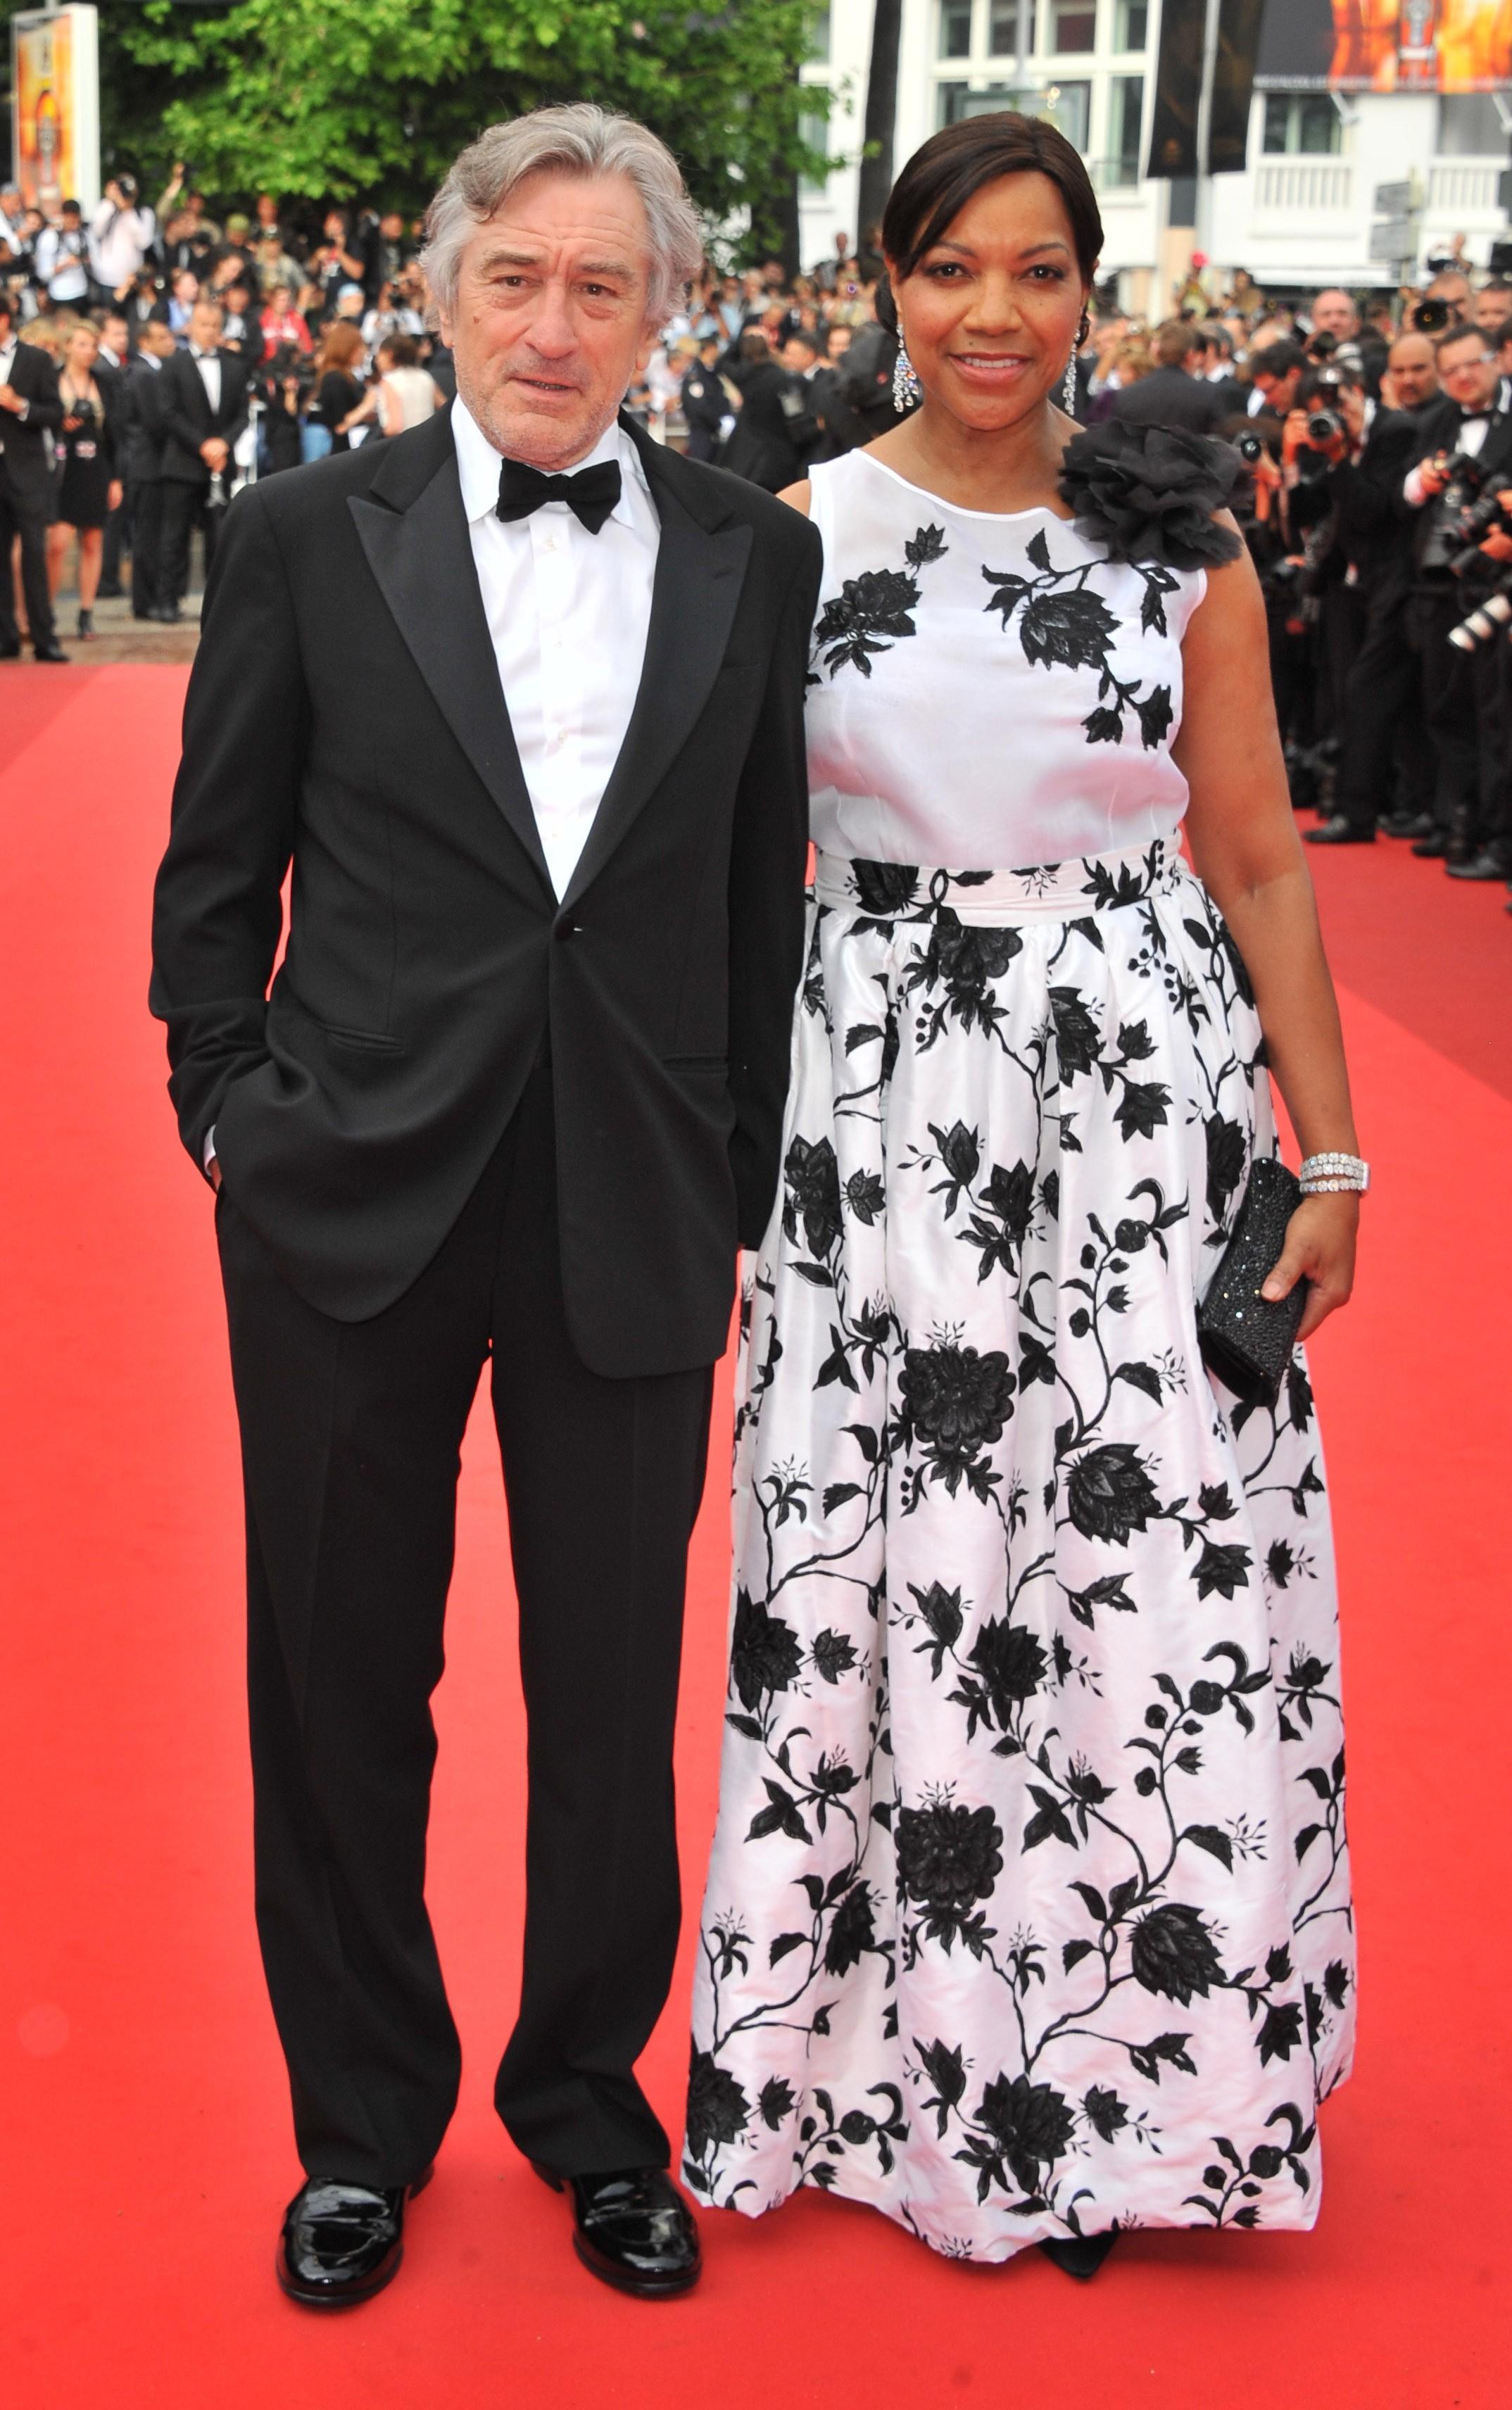 Robert De Niro And Wife Welcome Baby Girl Via Surrogate ...